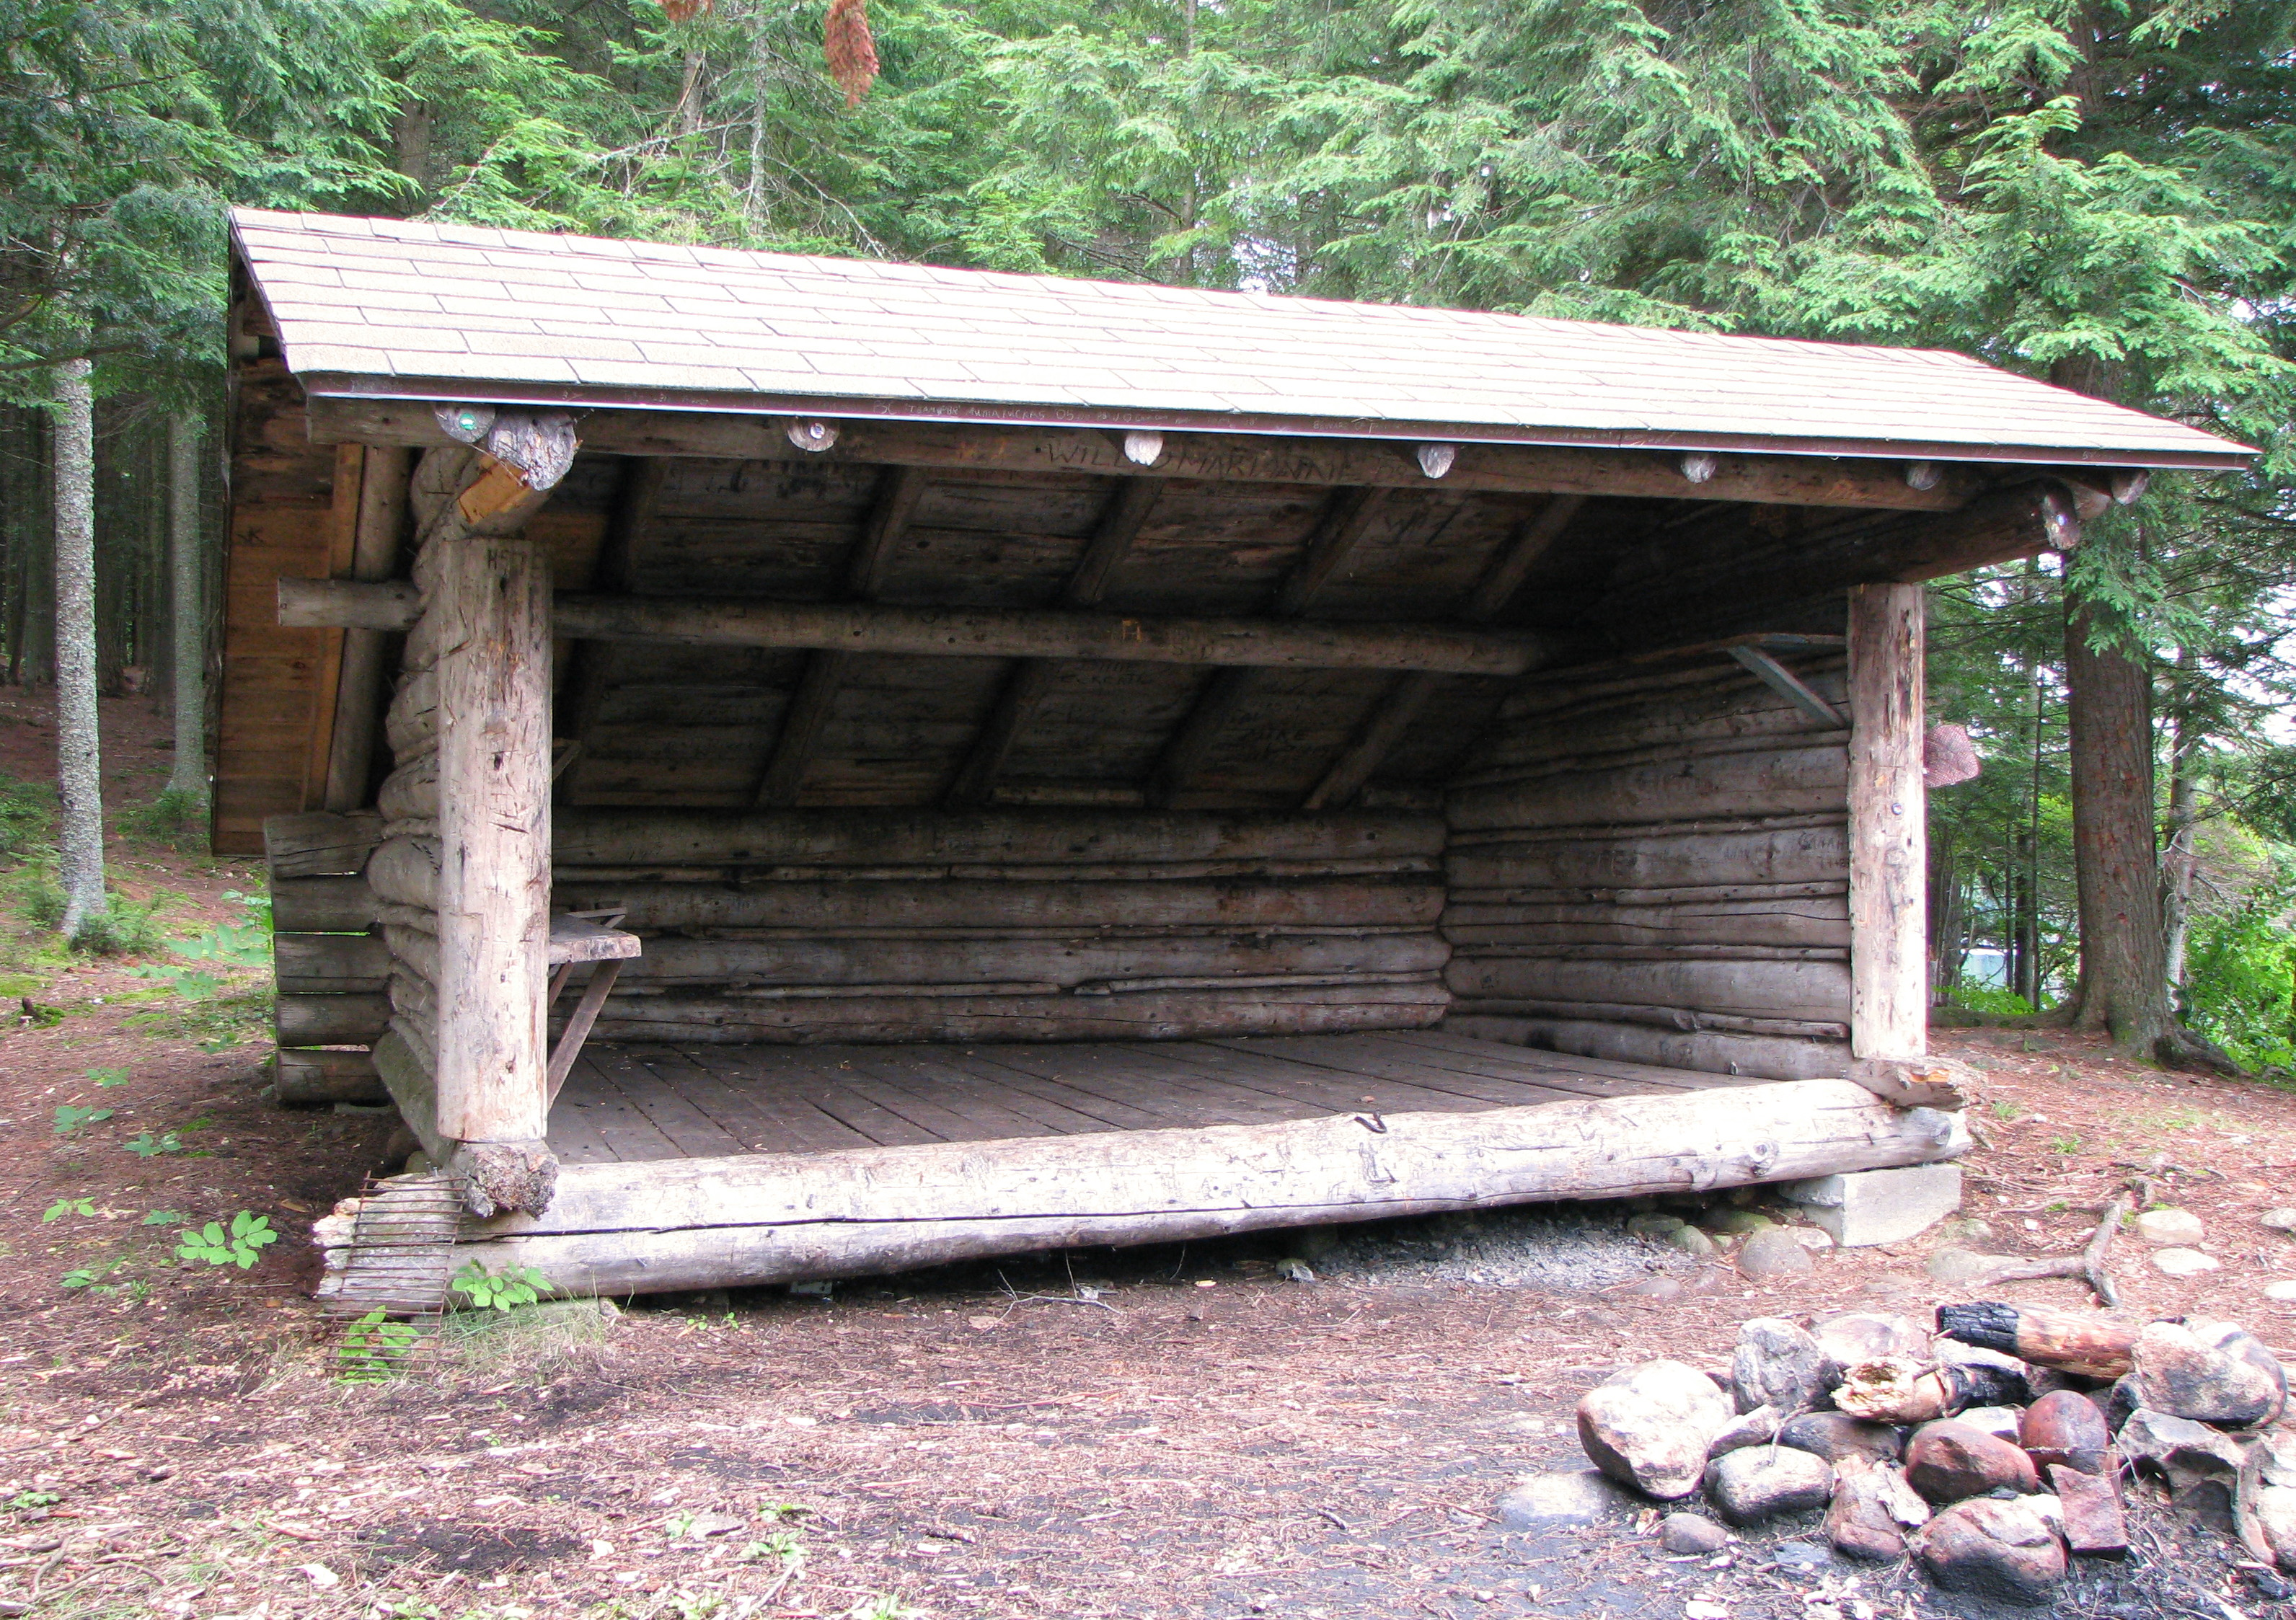 File:Adirondack Lean-to.jpg - Wikimedia Commons